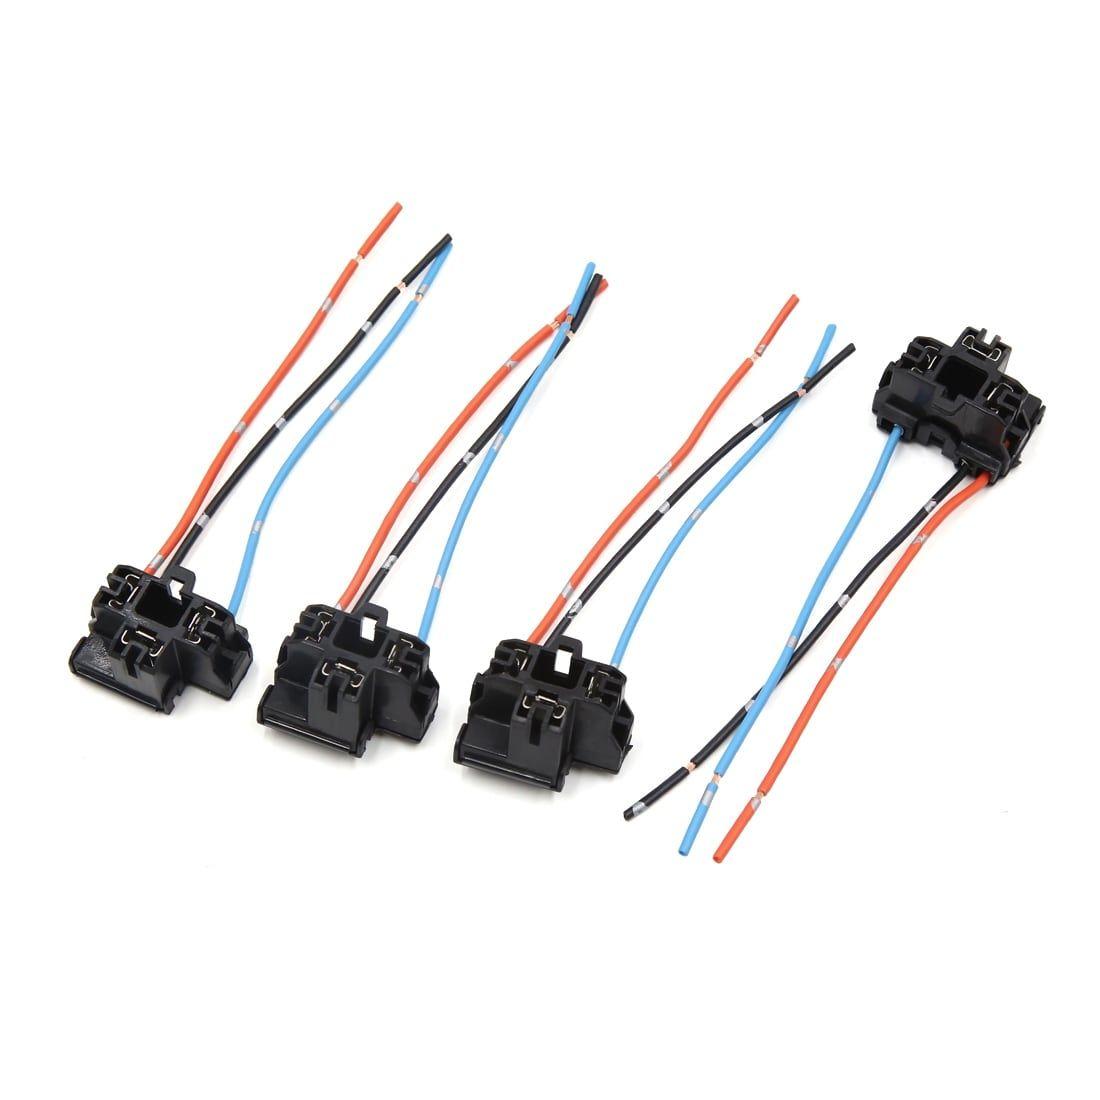 2 Pcs H4 Plastic Wire Wiring Car Head Light Bulb Harness Socket A Connector